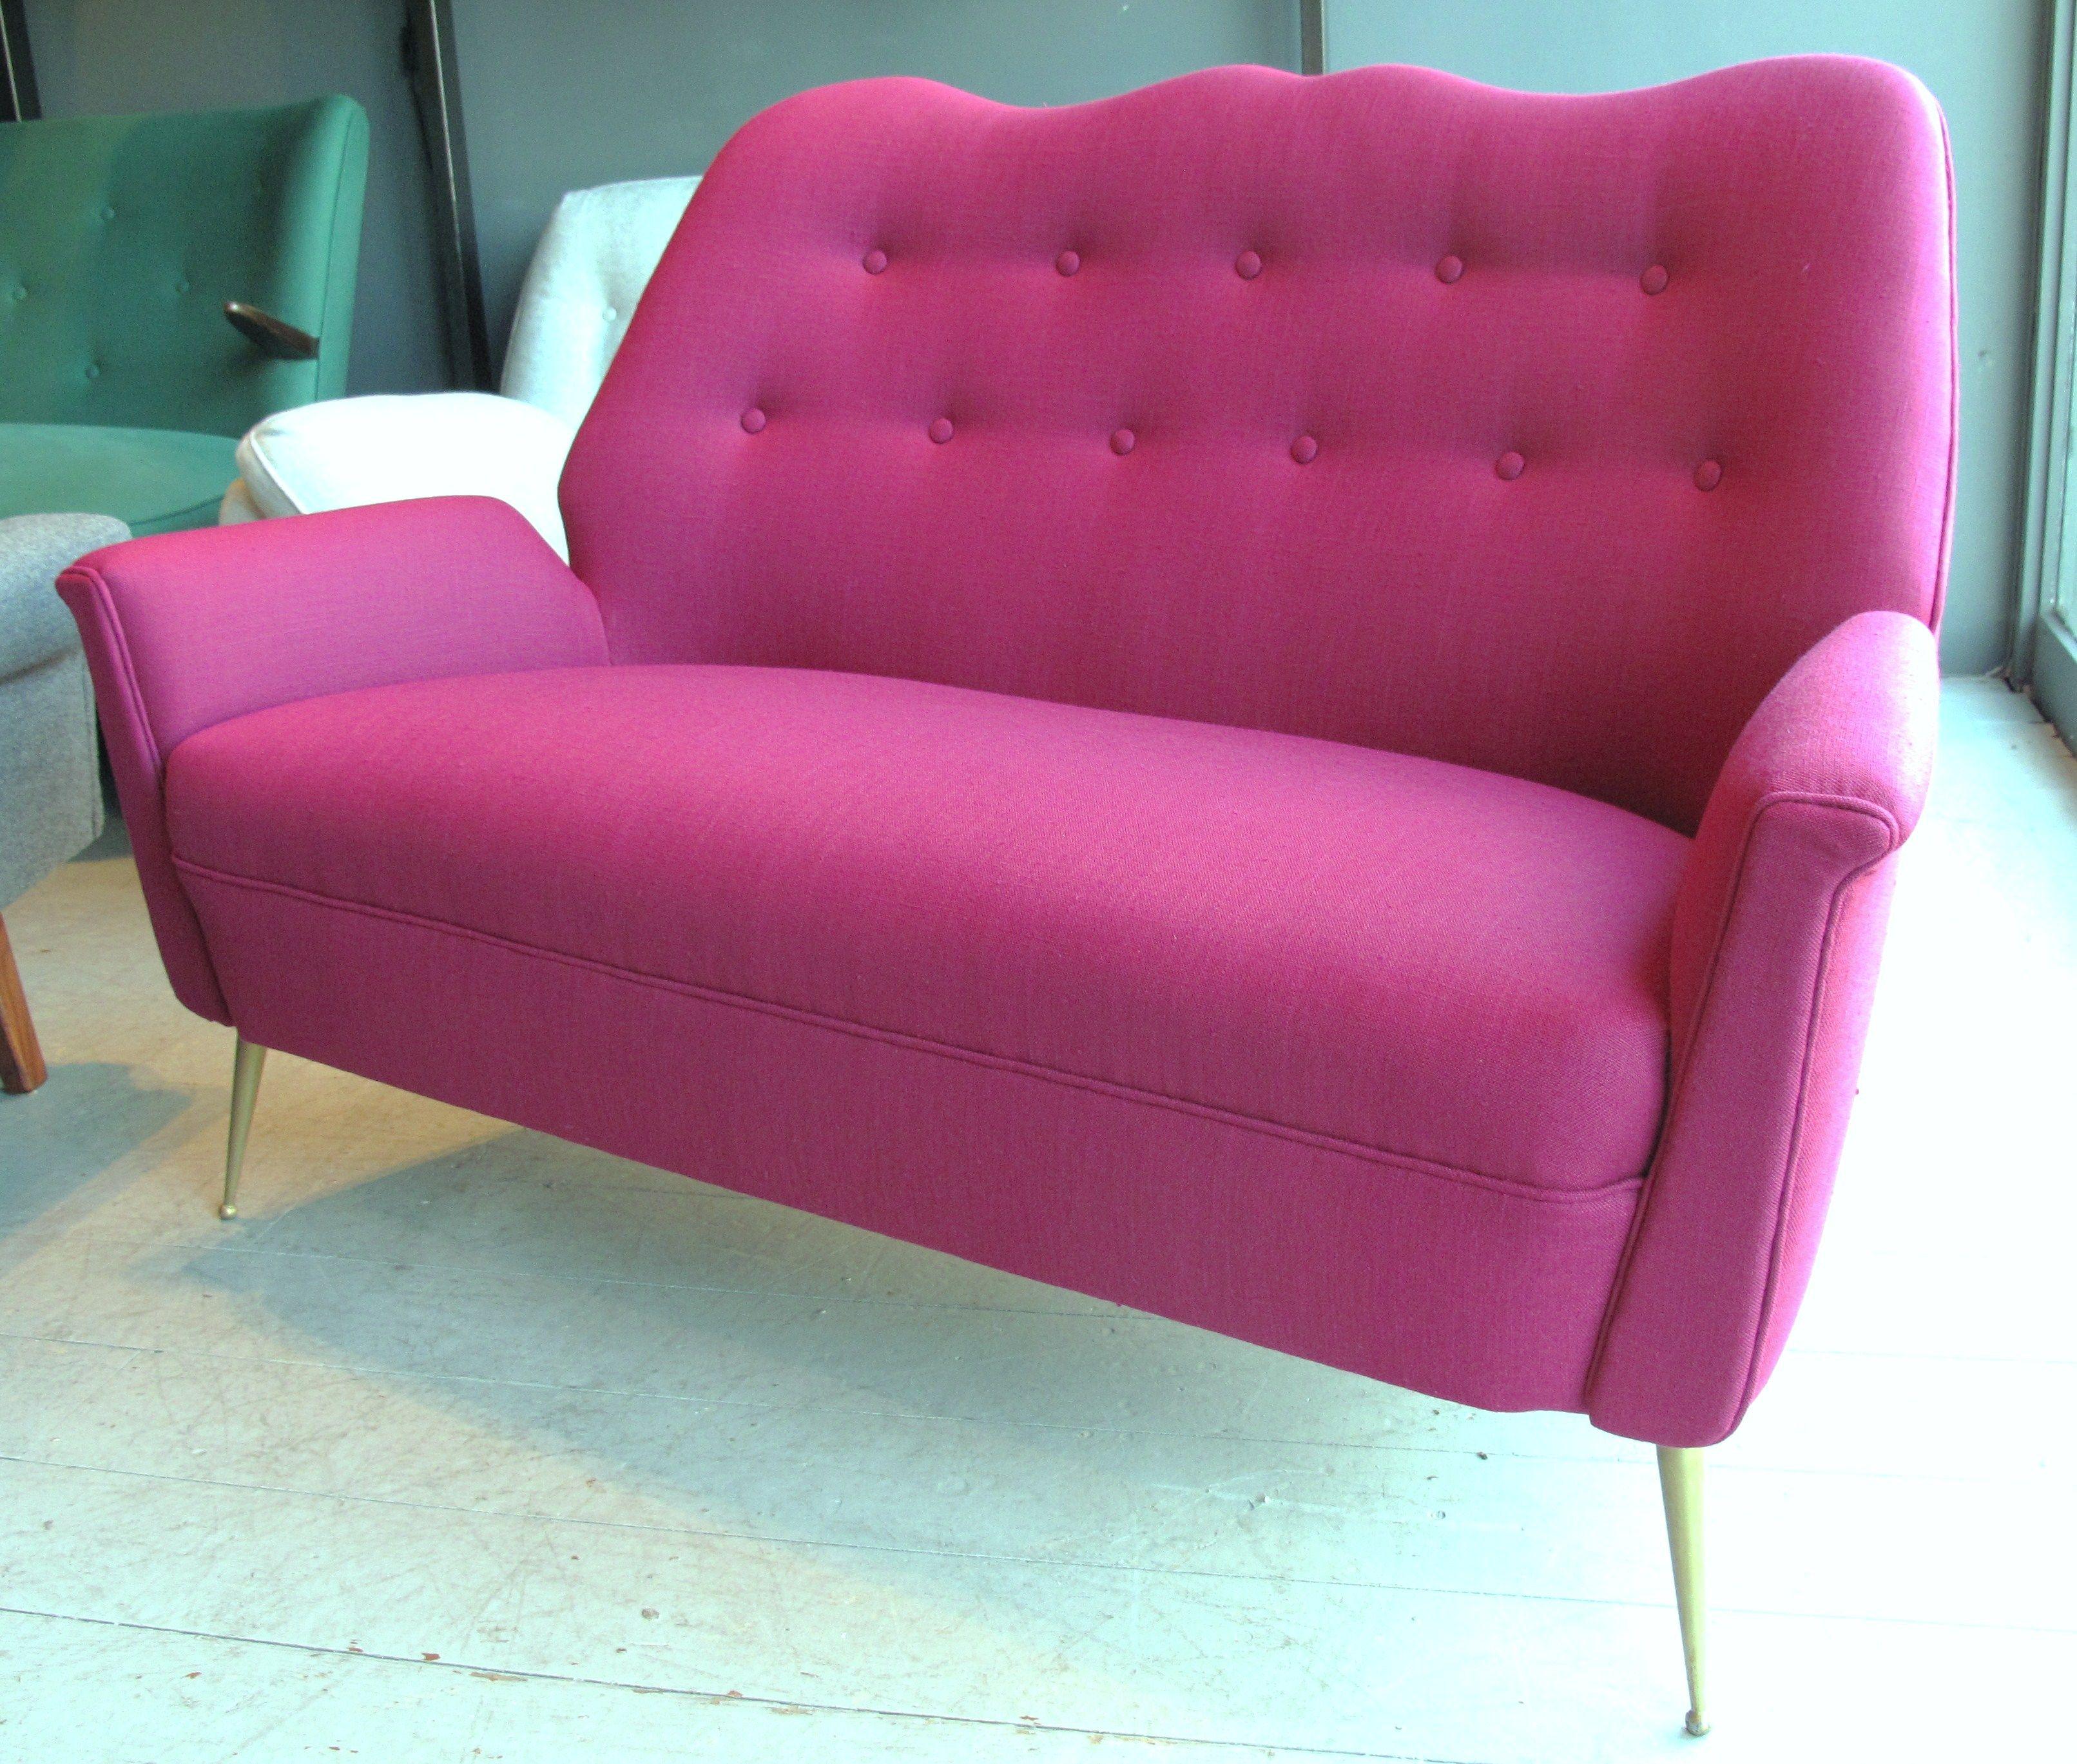 Italian 1950's Small Sofa With Brass Legs.